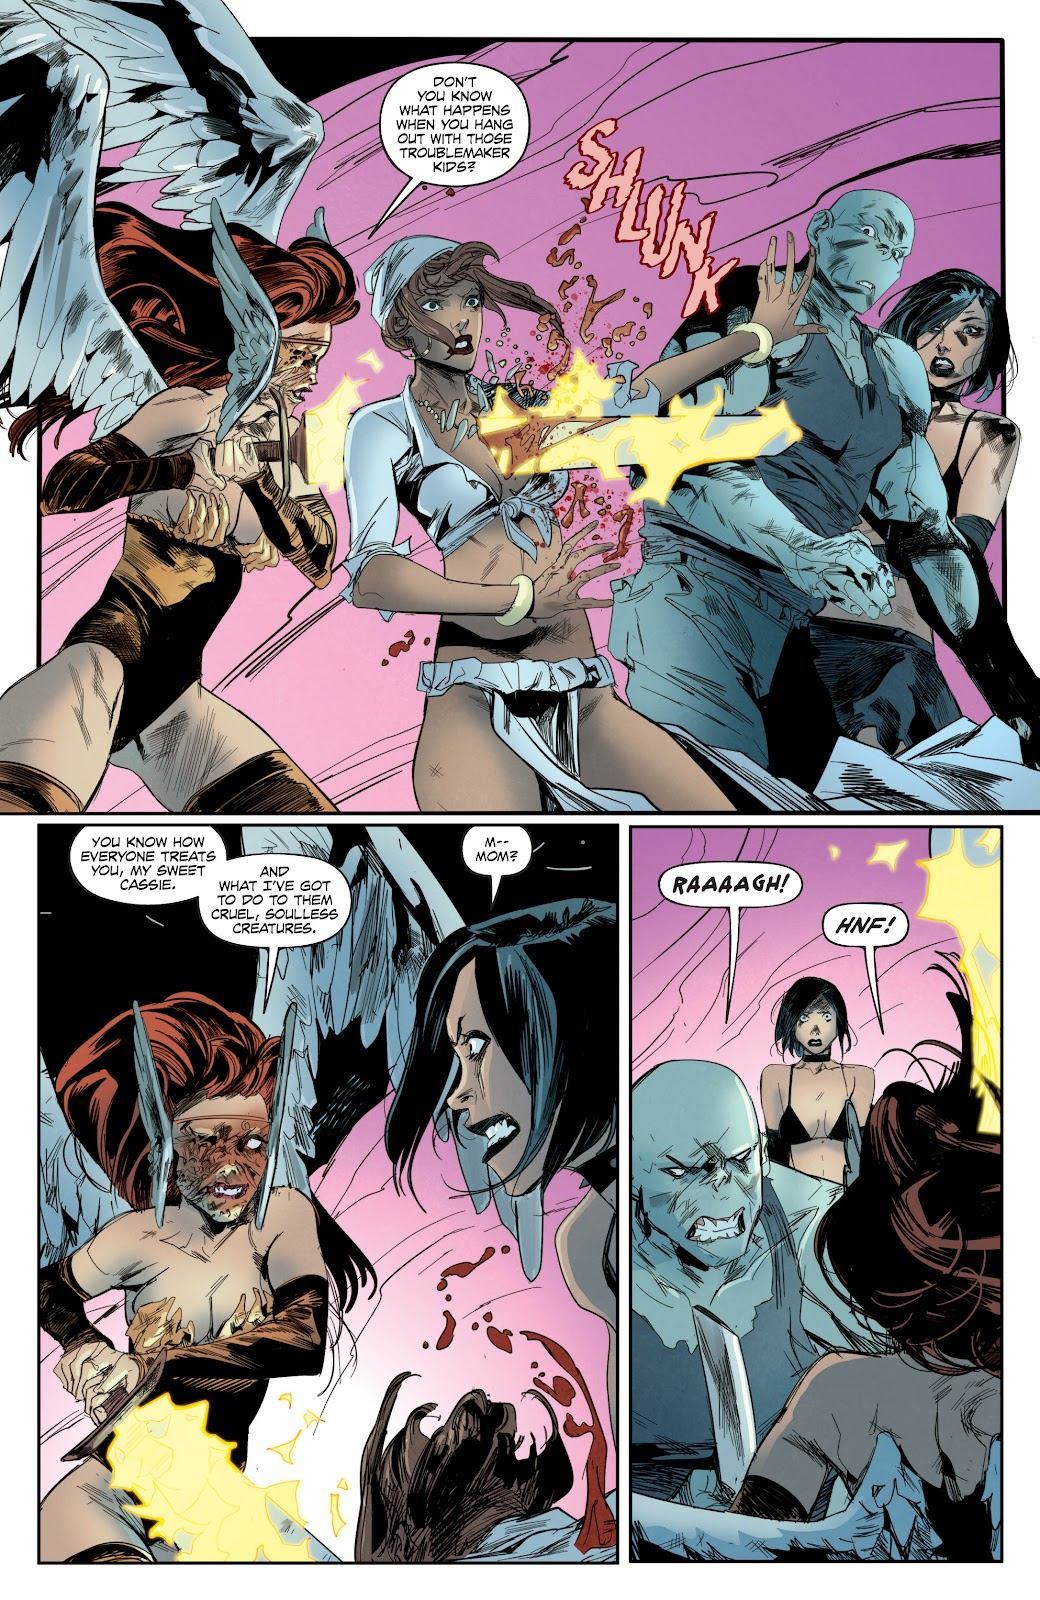 Read online Hack/Slash vs. Chaos comic -  Issue #4 - 11